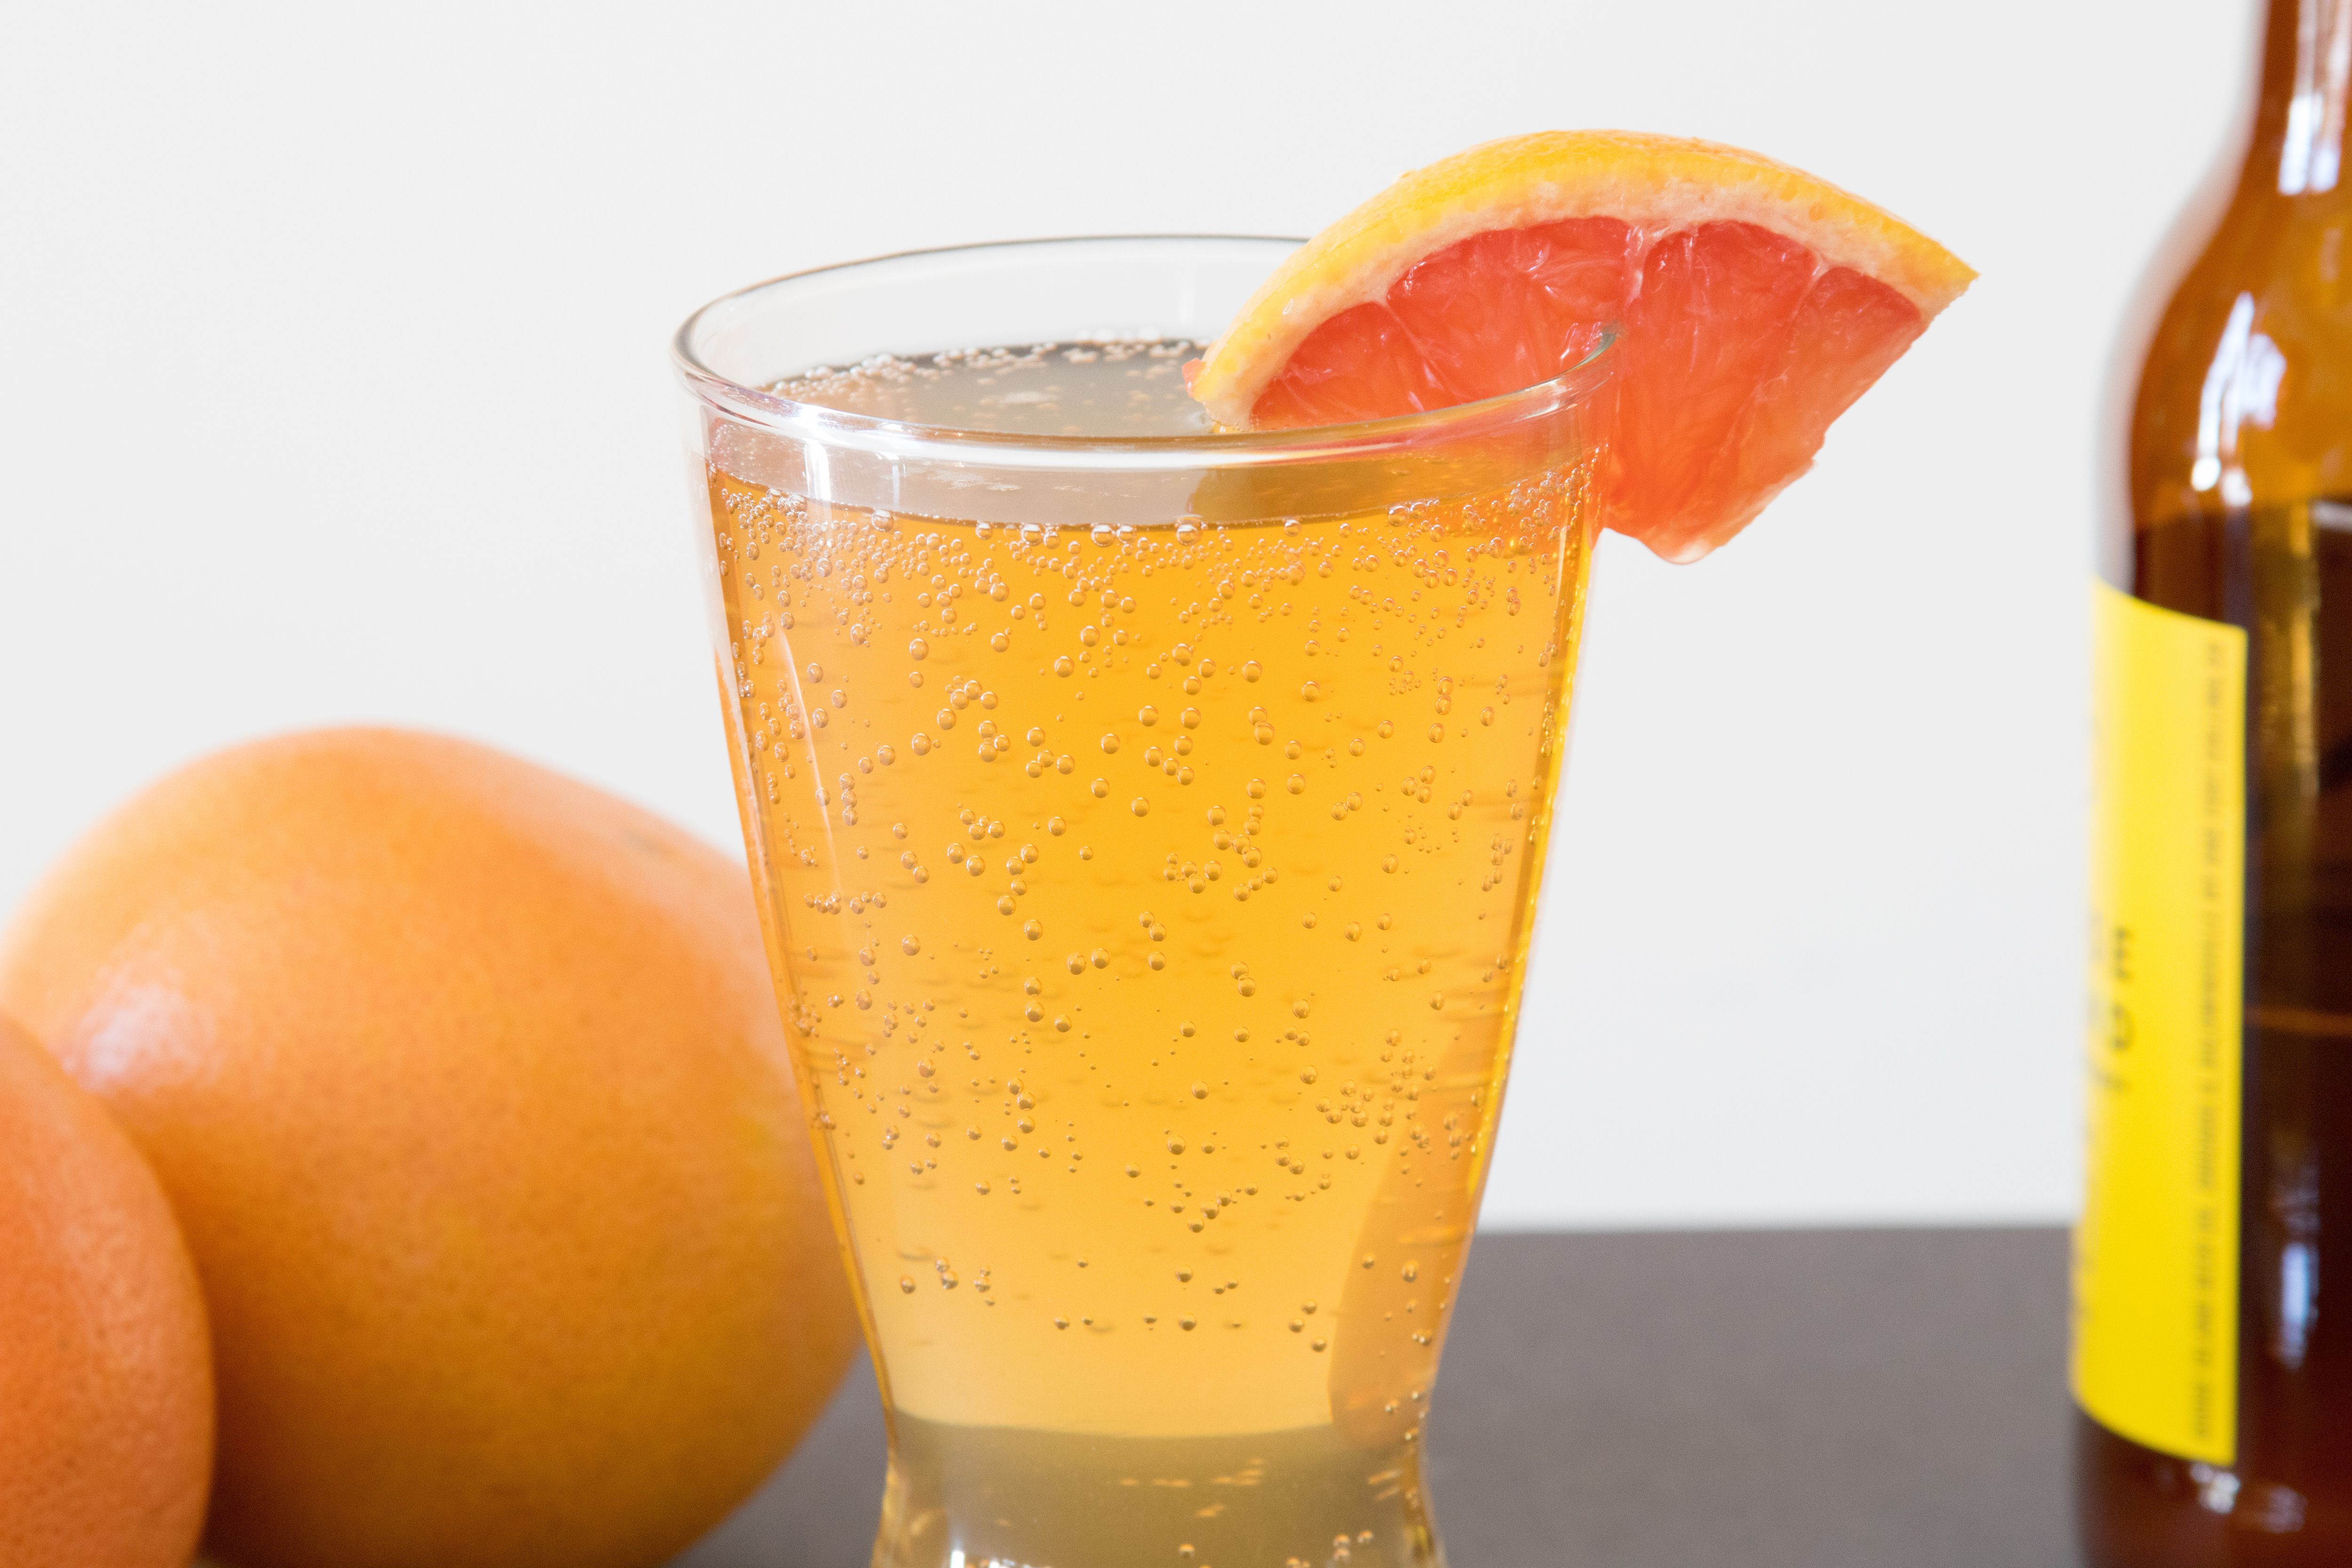 Grapefruit Garnish for a Grapefruit Shandy